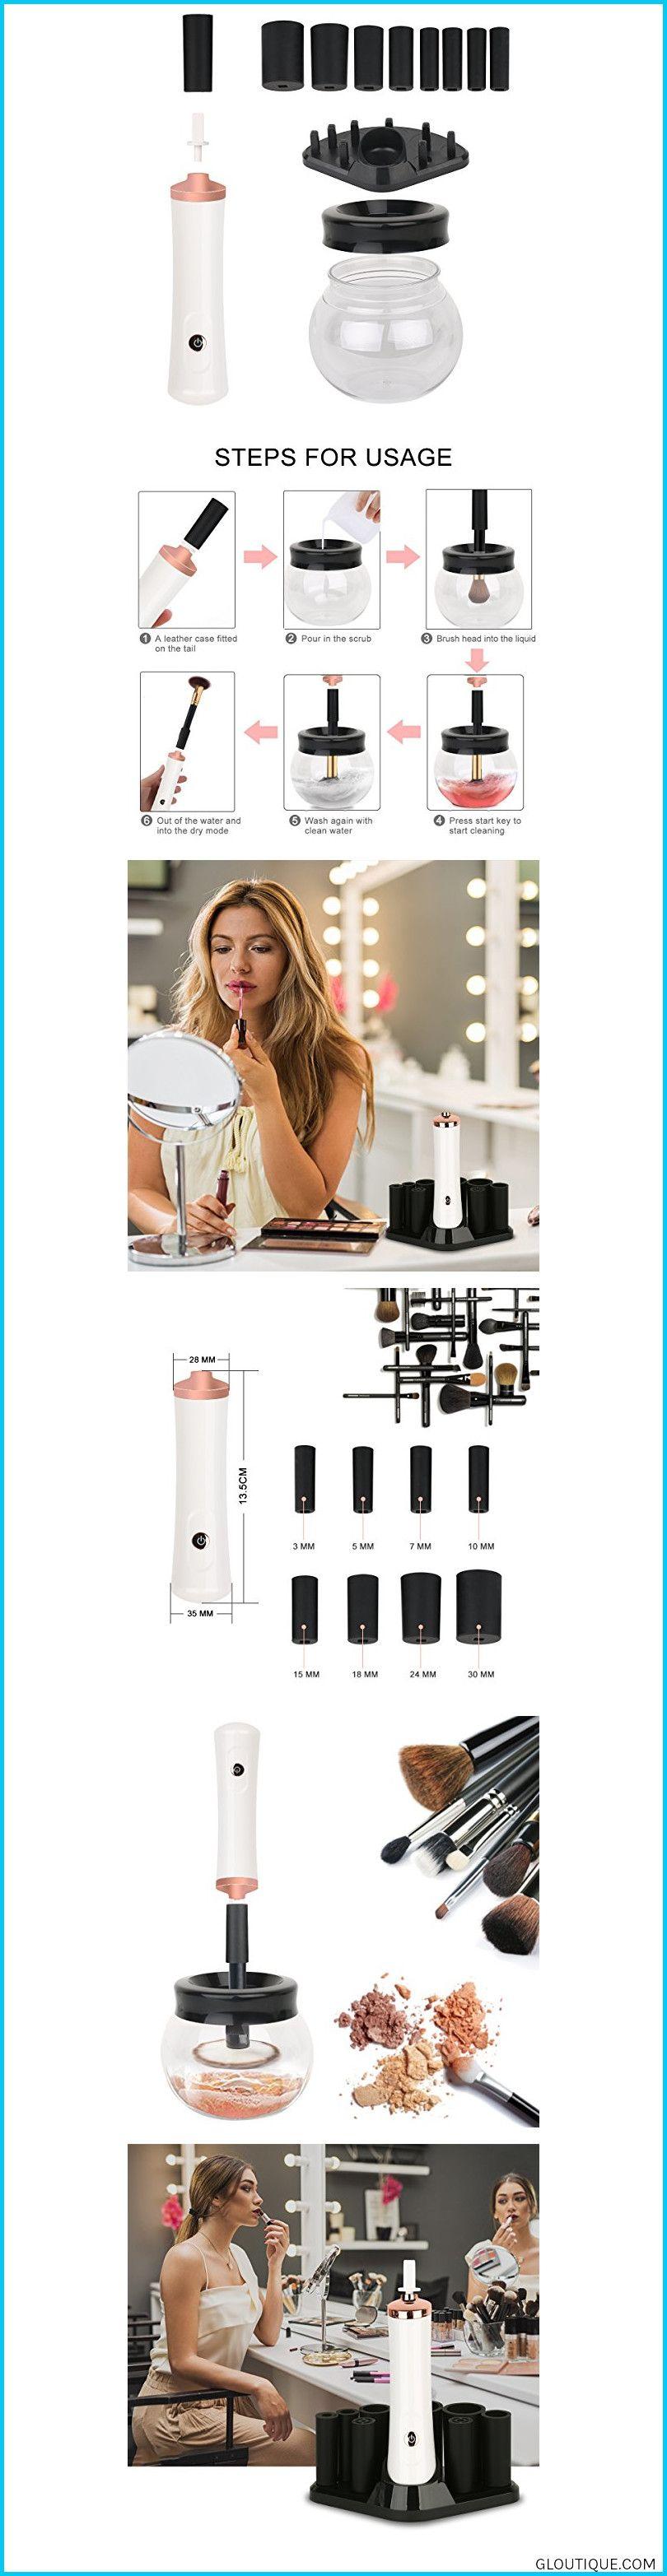 Makeup Brush Cleaner, INKERSCOOP Electric Makeup Brush